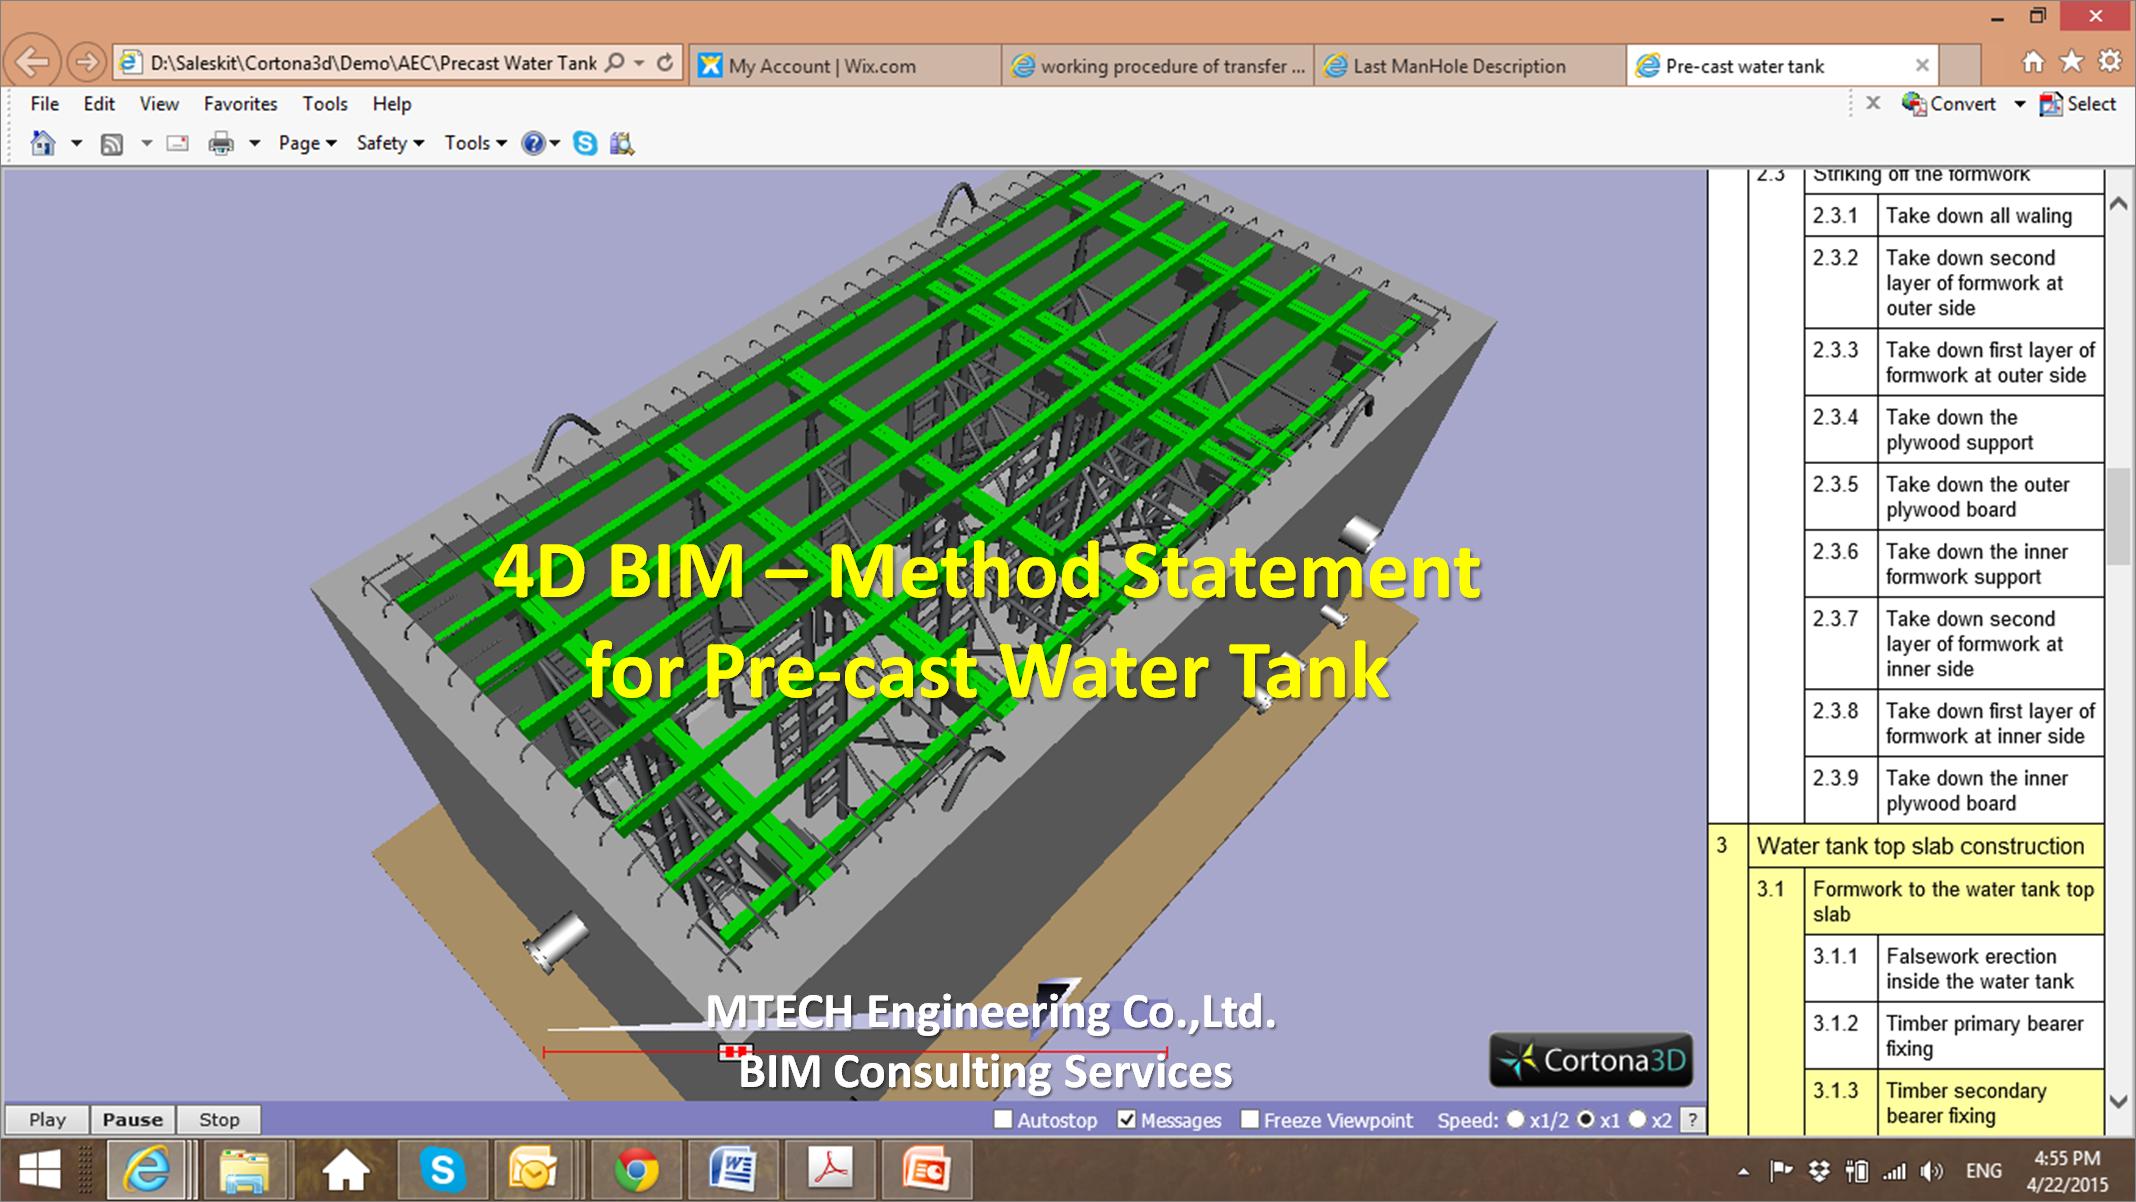 Pre-cast Water Tank Method Statement